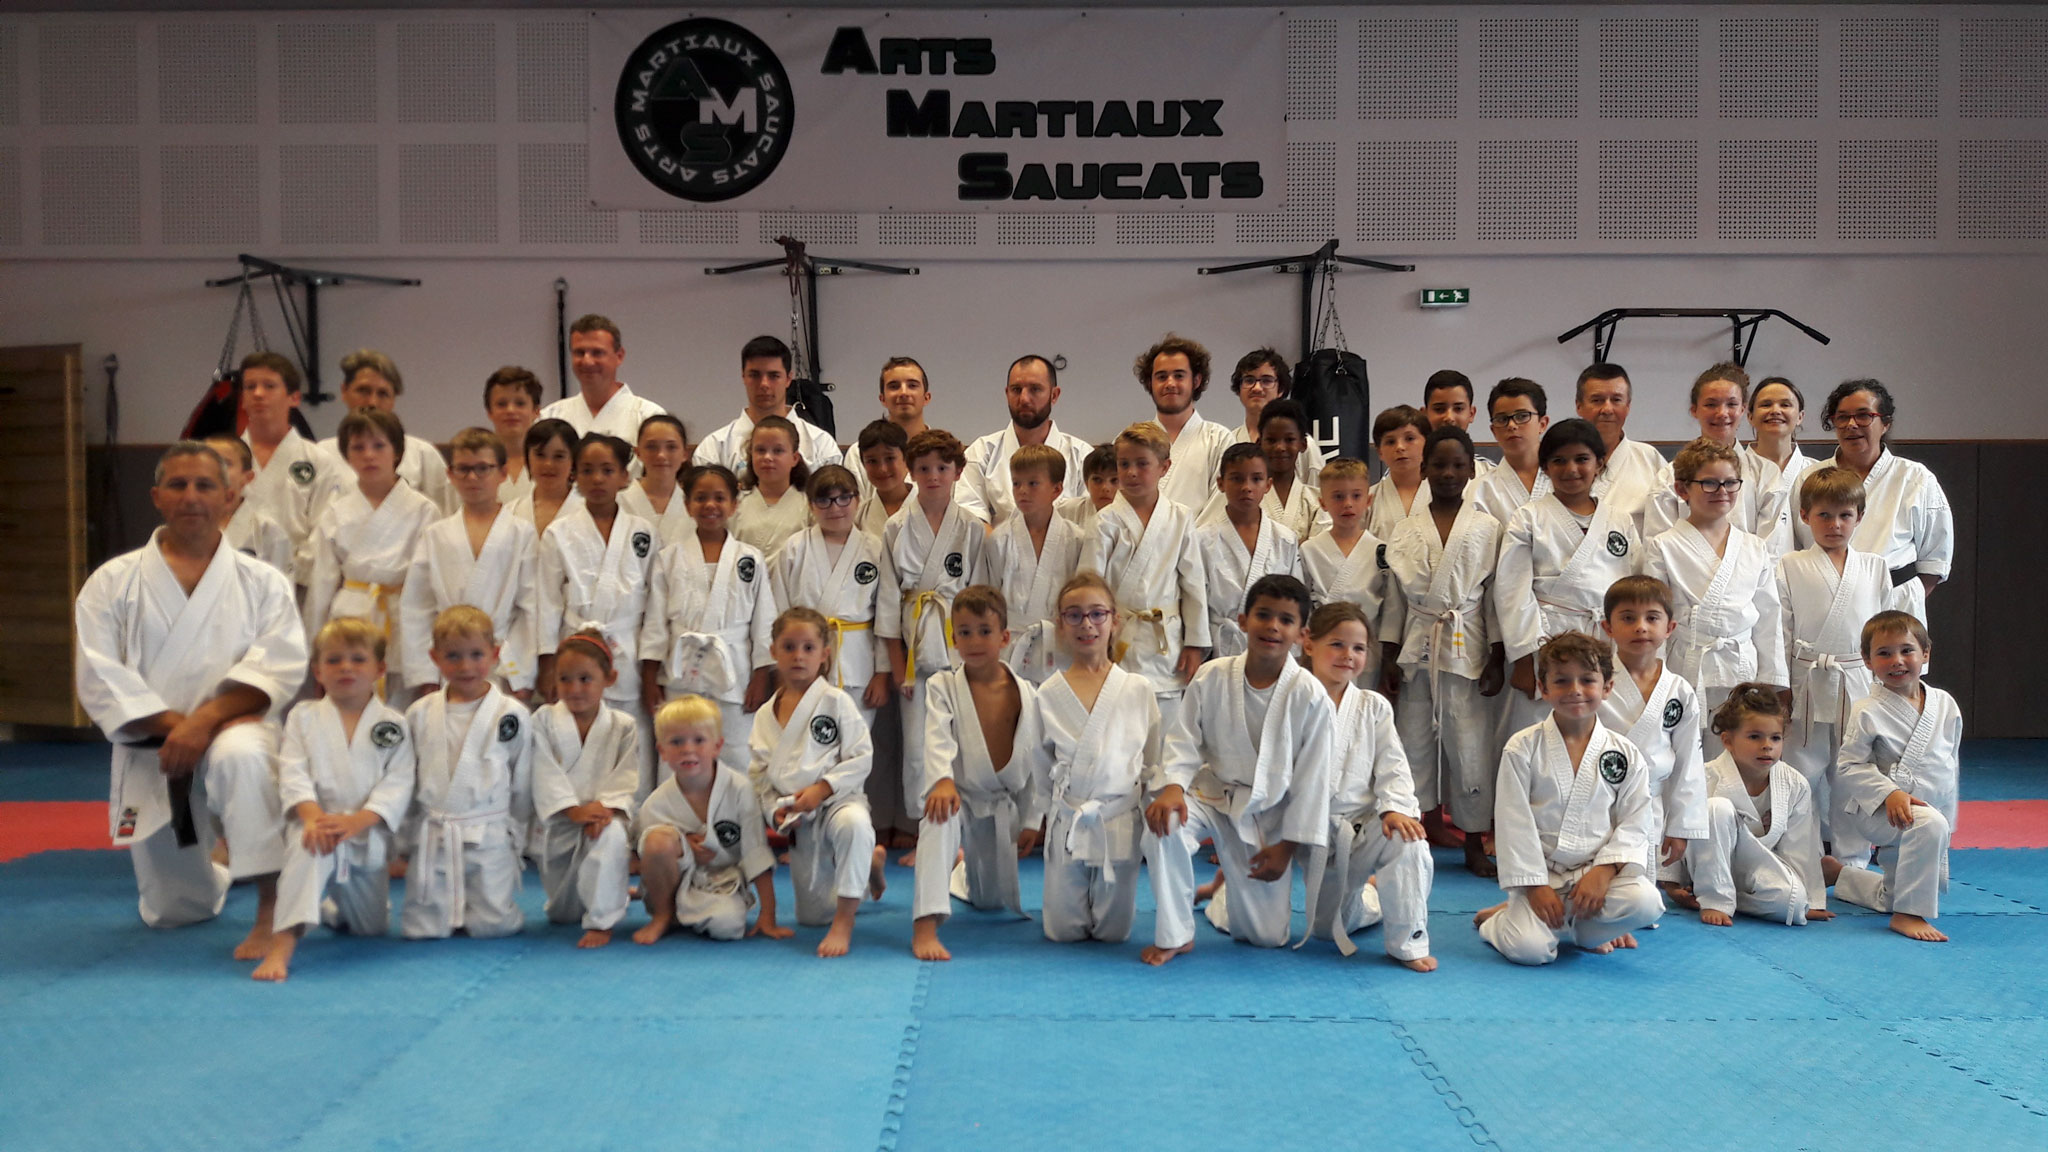 arts-martiaux-saucats-karate-do-7